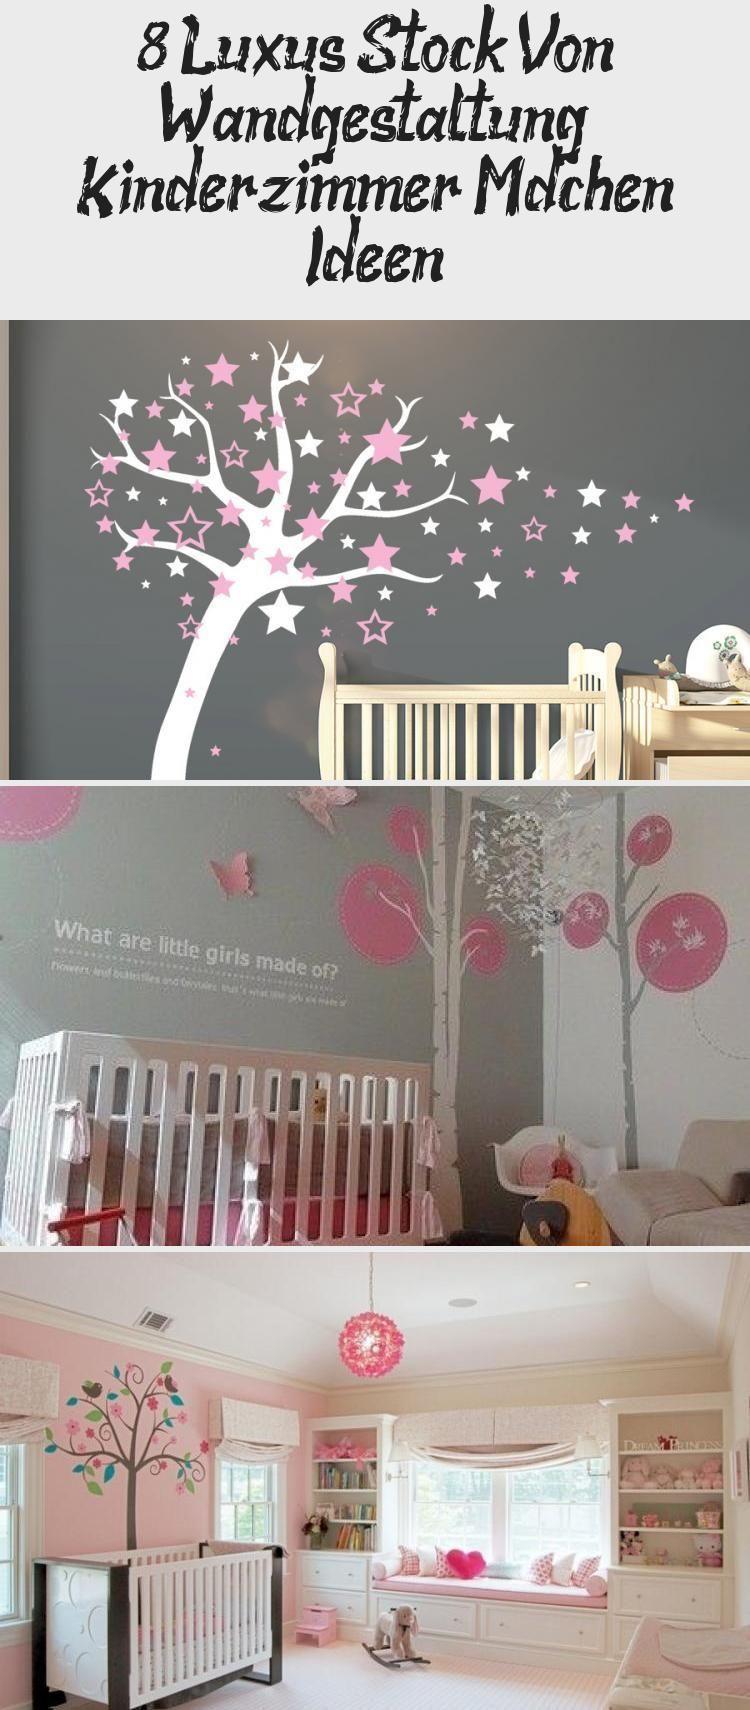 8 luxusboden wandgestaltung kinderzimmer madchen ideen babyzimmermdch kindergarten wandtattoos kobolo wandbild metall bastelideen wanddekoration